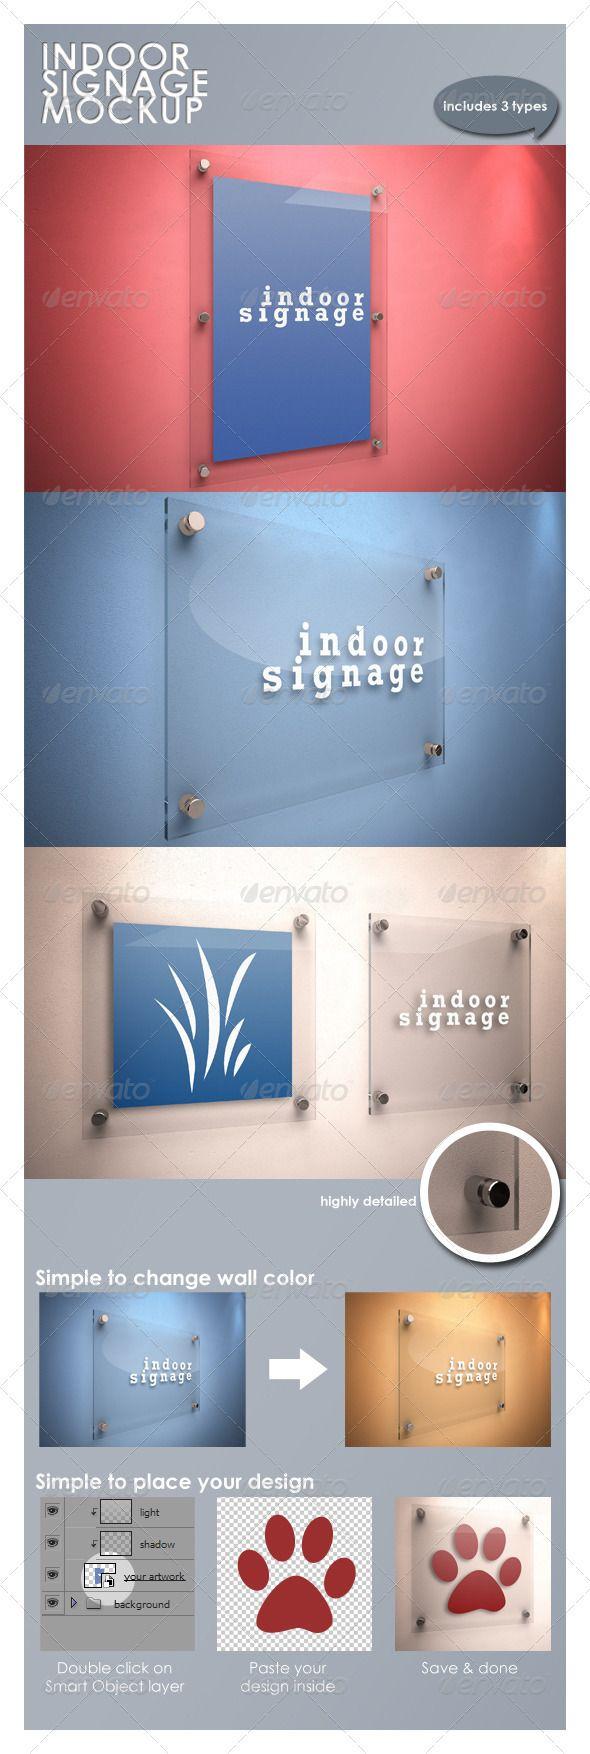 Indoor Signage Mockup – Gra